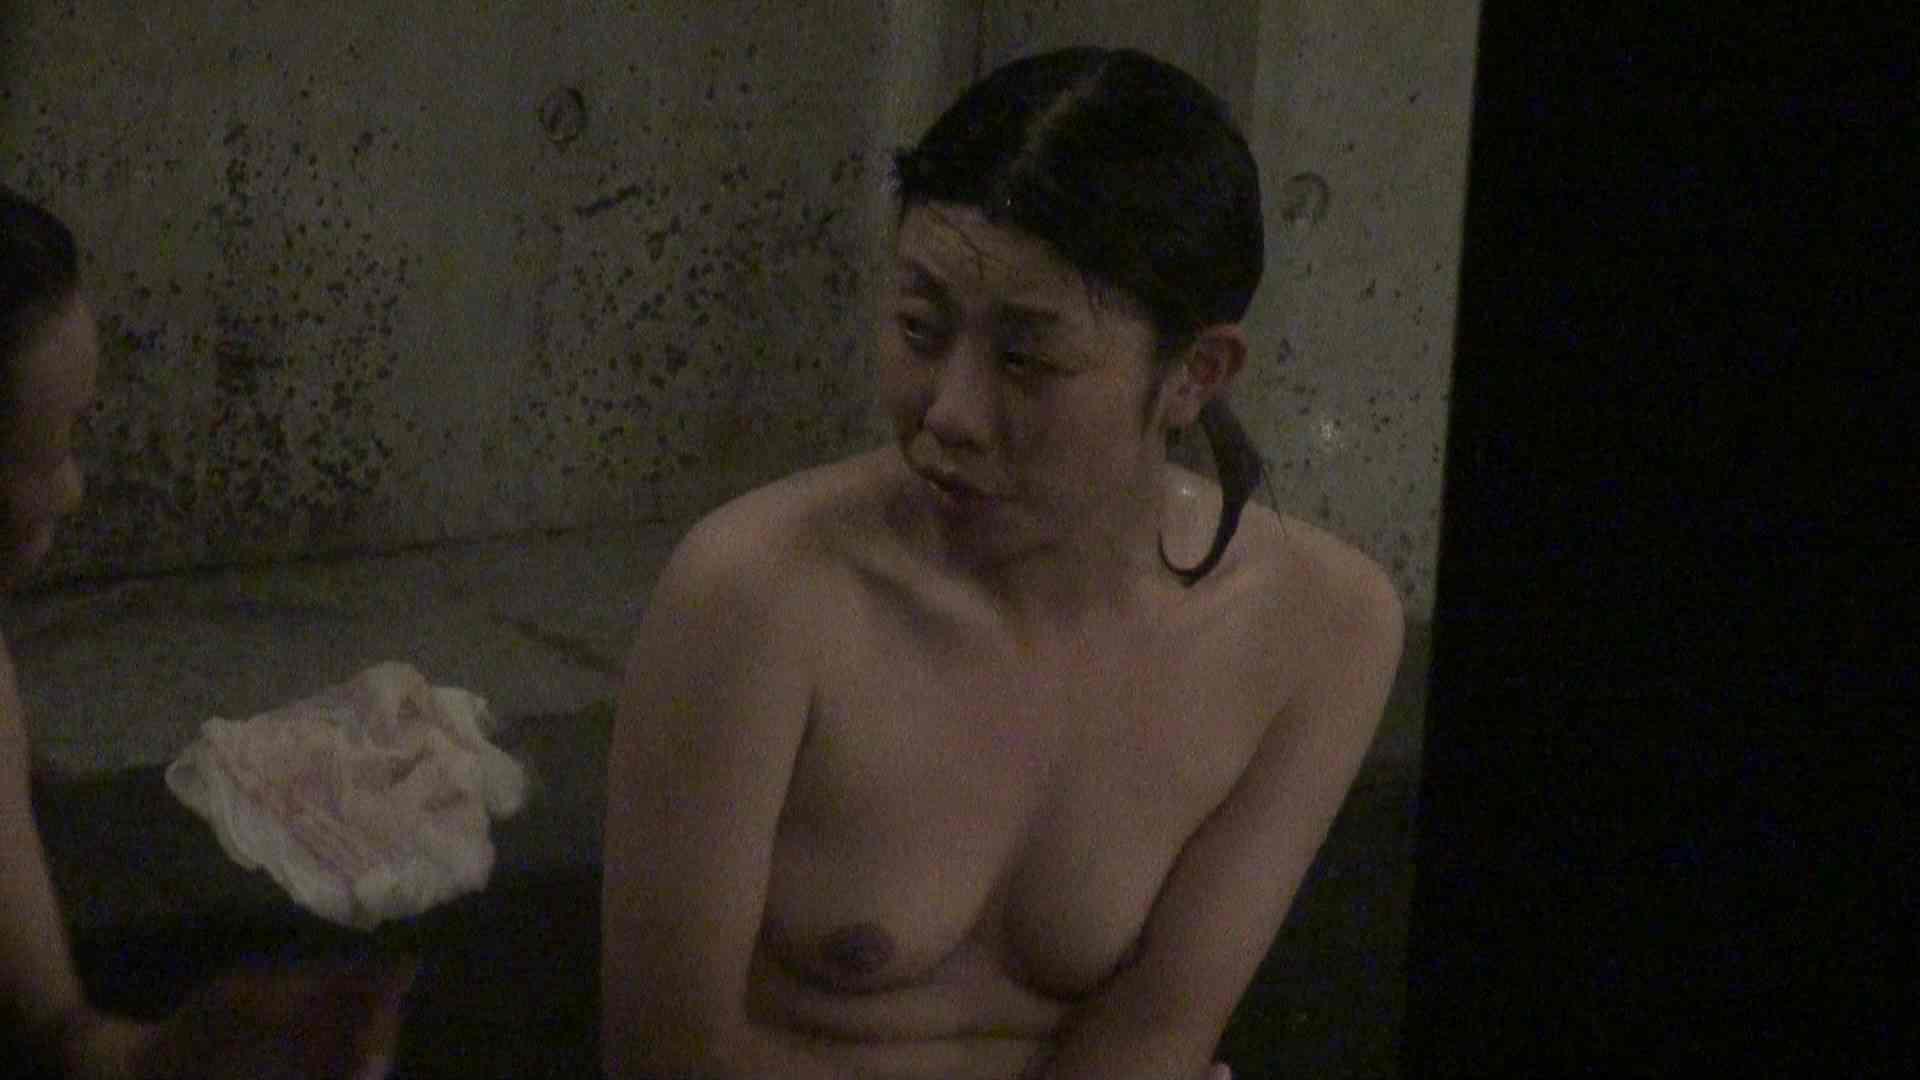 Aquaな露天風呂Vol.330 OLのエロ生活 | 露天風呂  101連発 16